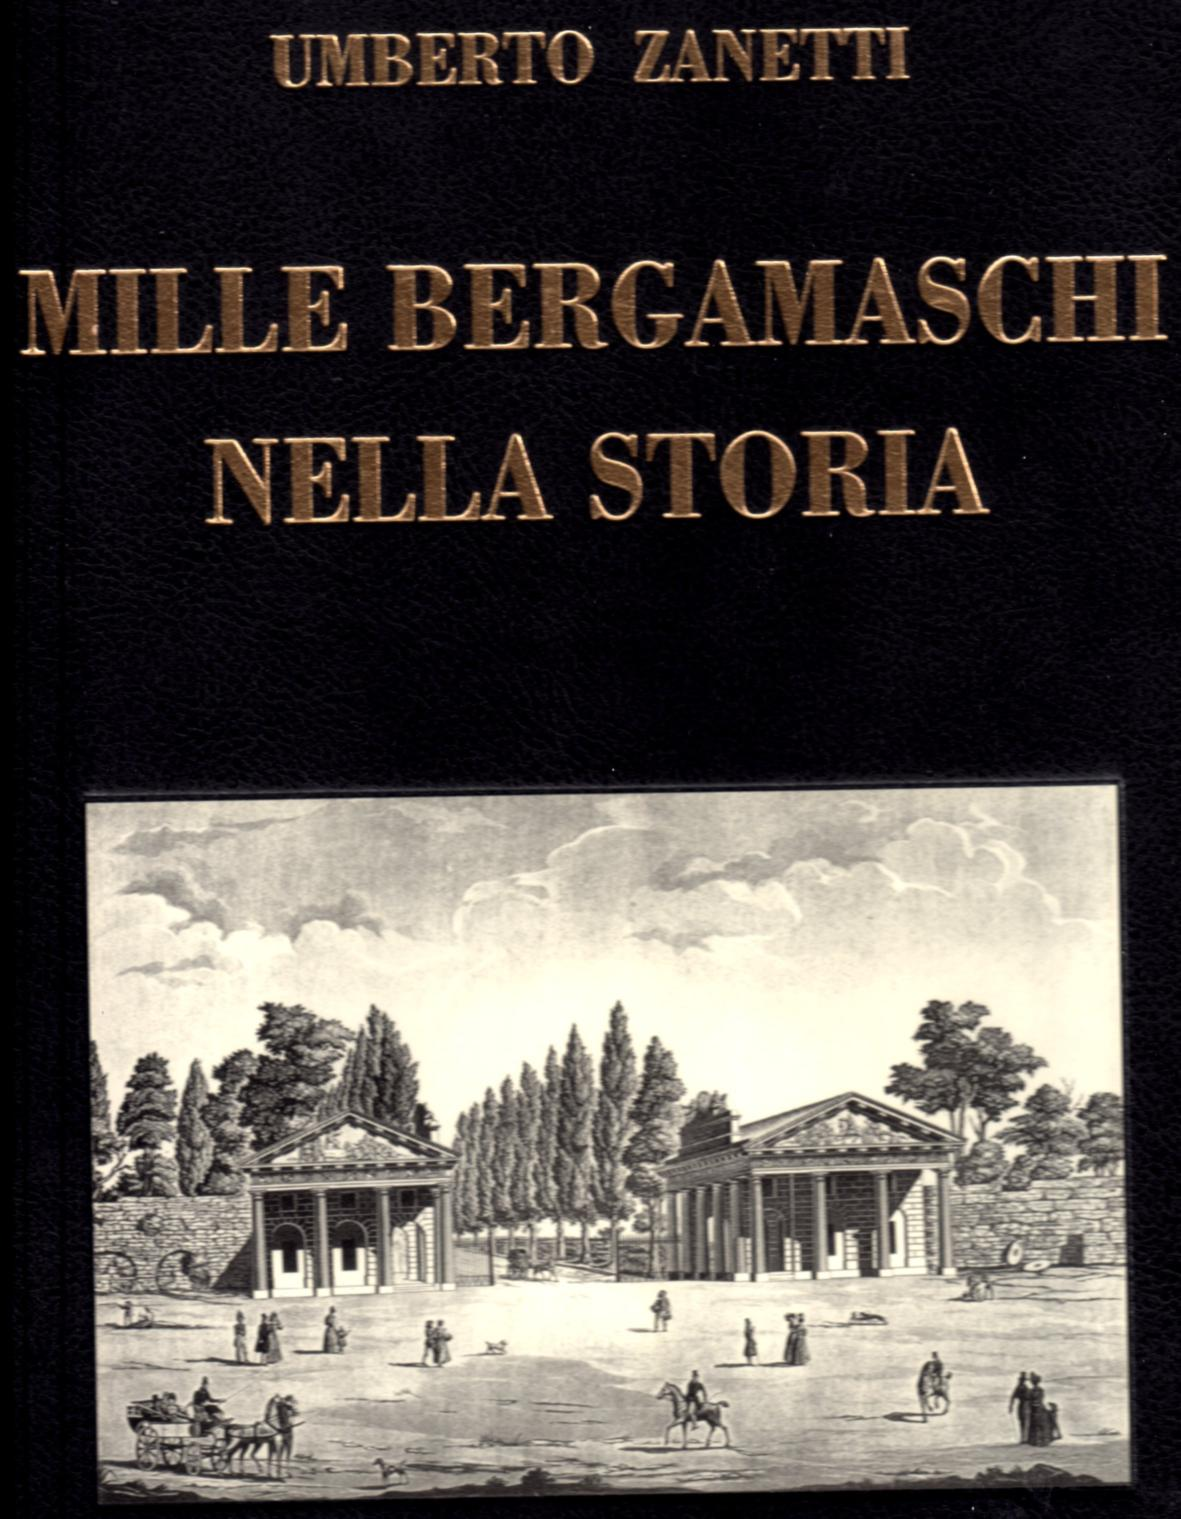 34 - i mille bergamaschi